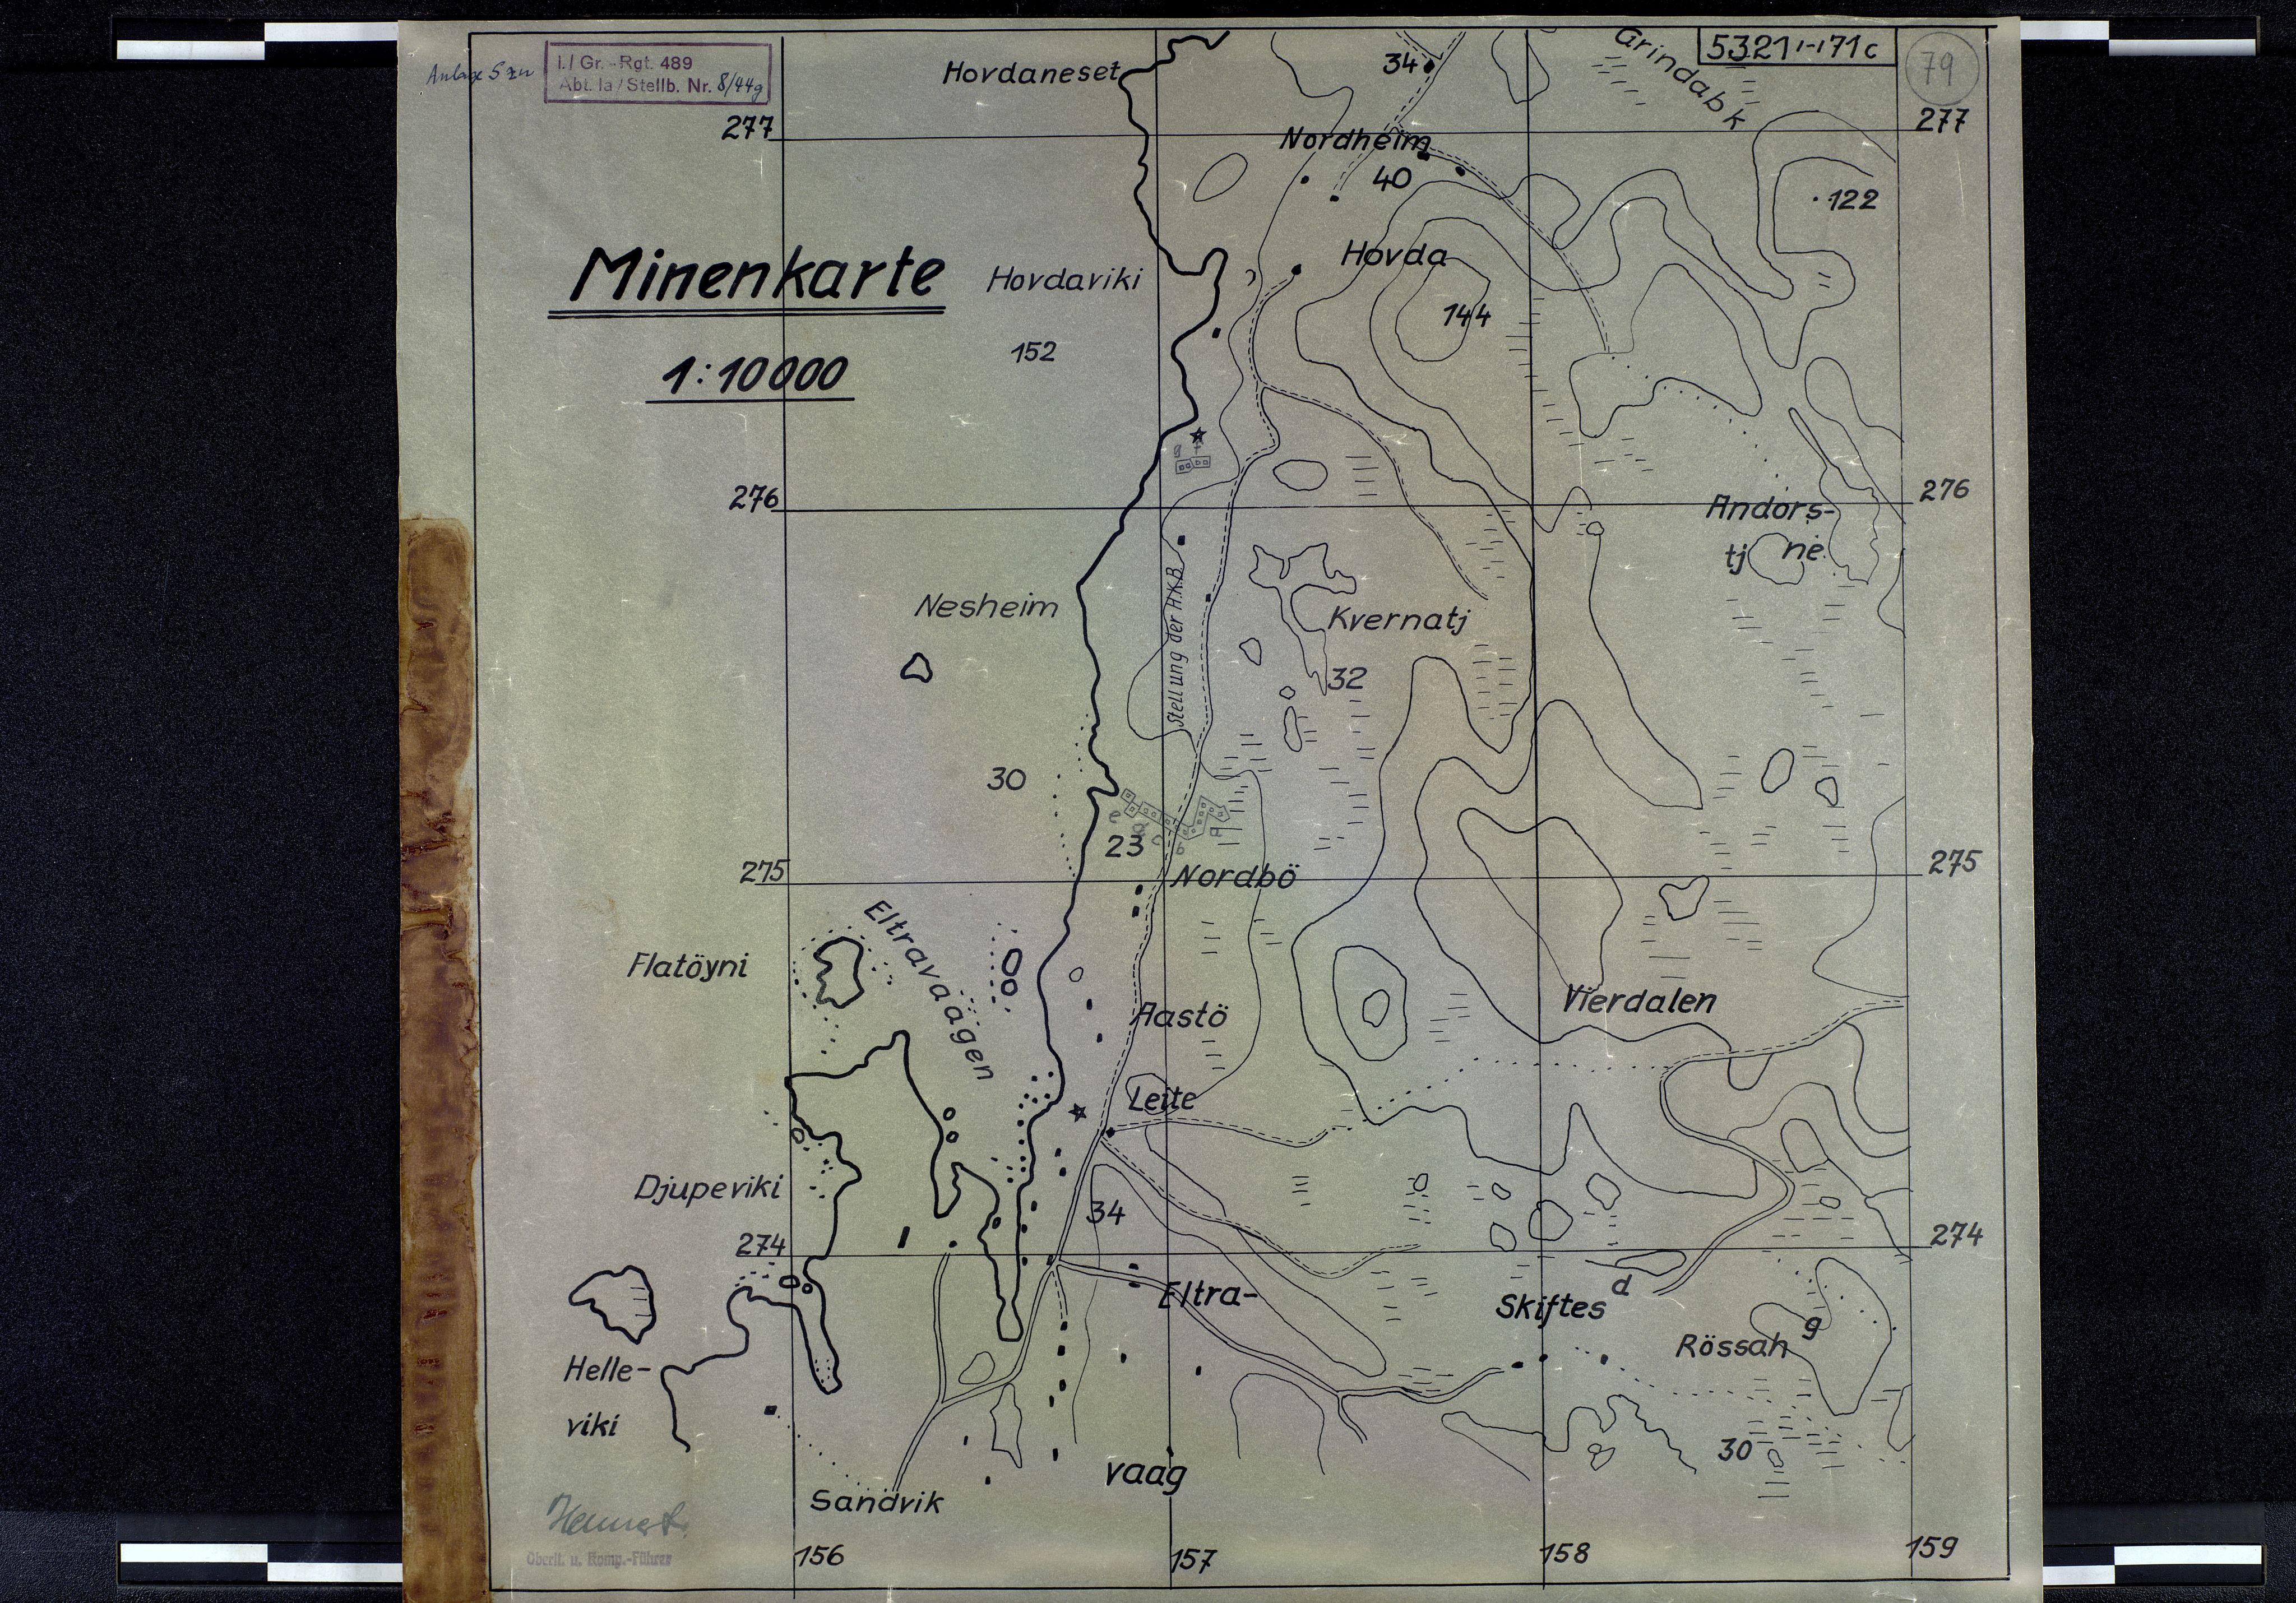 SAB, Ukjent arkiv (SAB), 1943-1945, s. 85